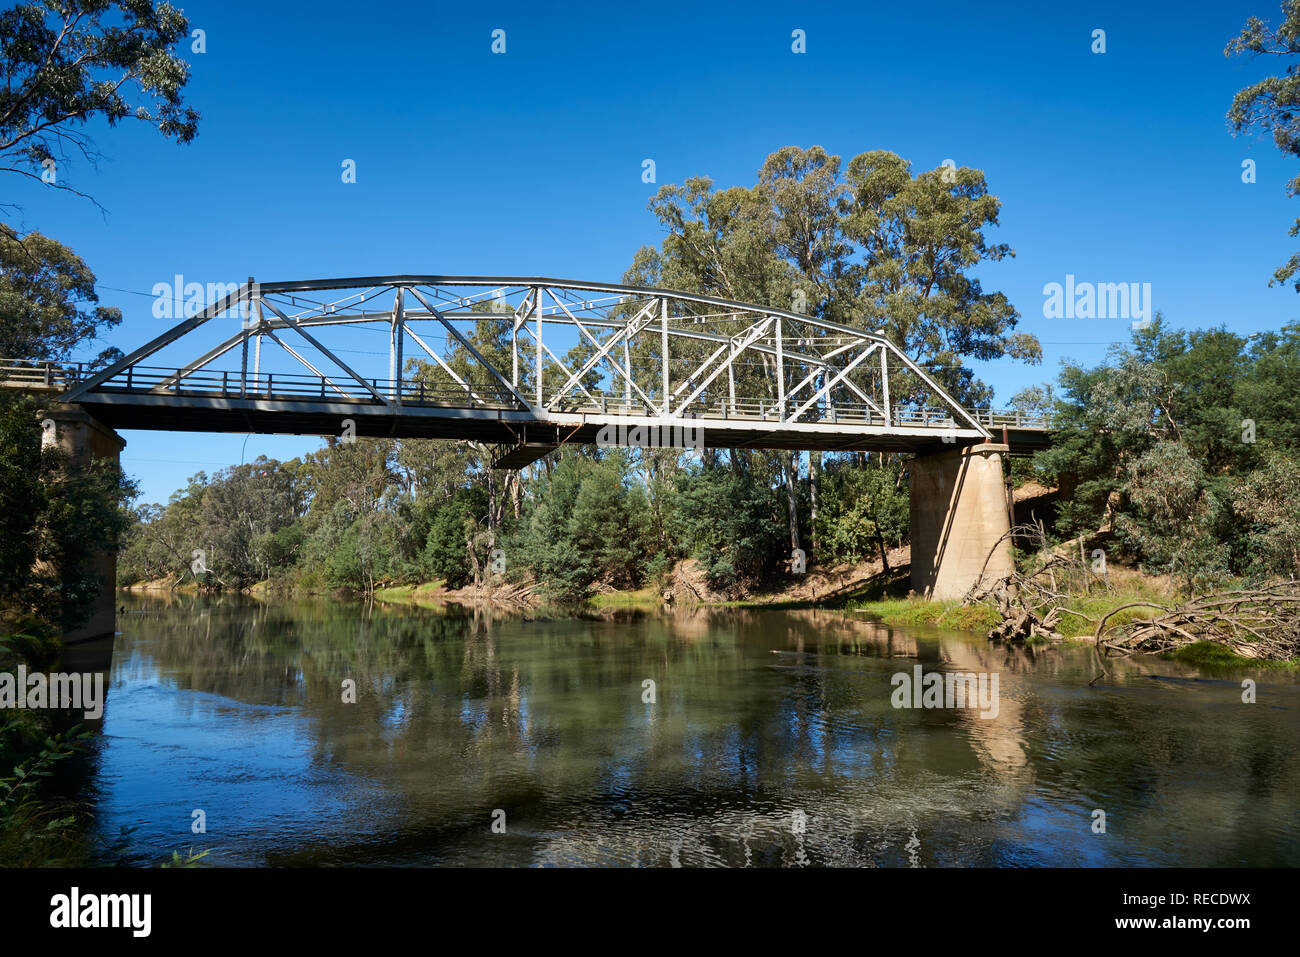 Road bridge at Murchison, Victoria, Australia. - Stock Image